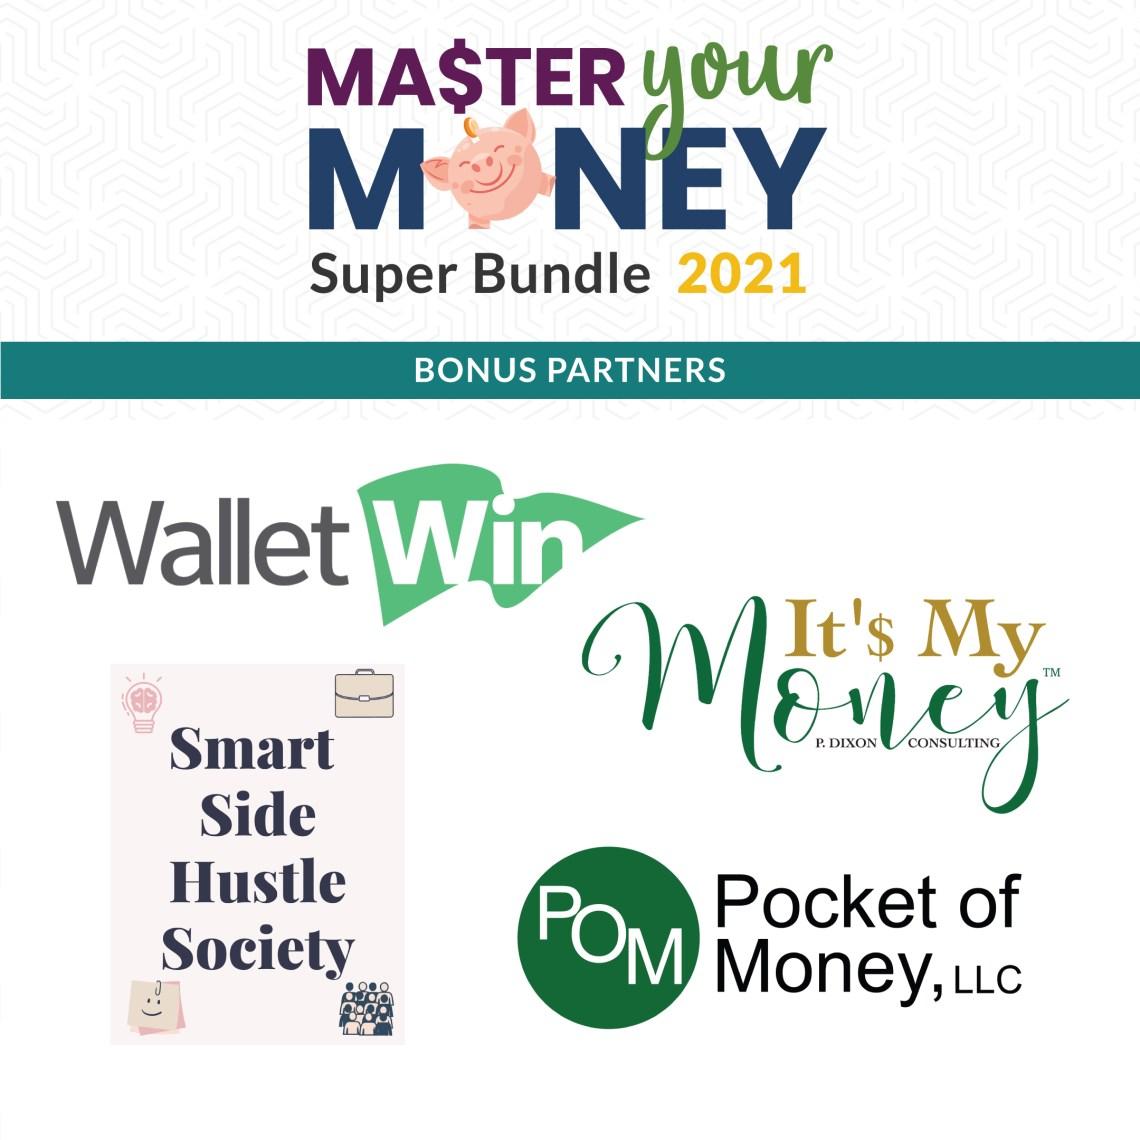 Master Your Money Super Bundle 2021